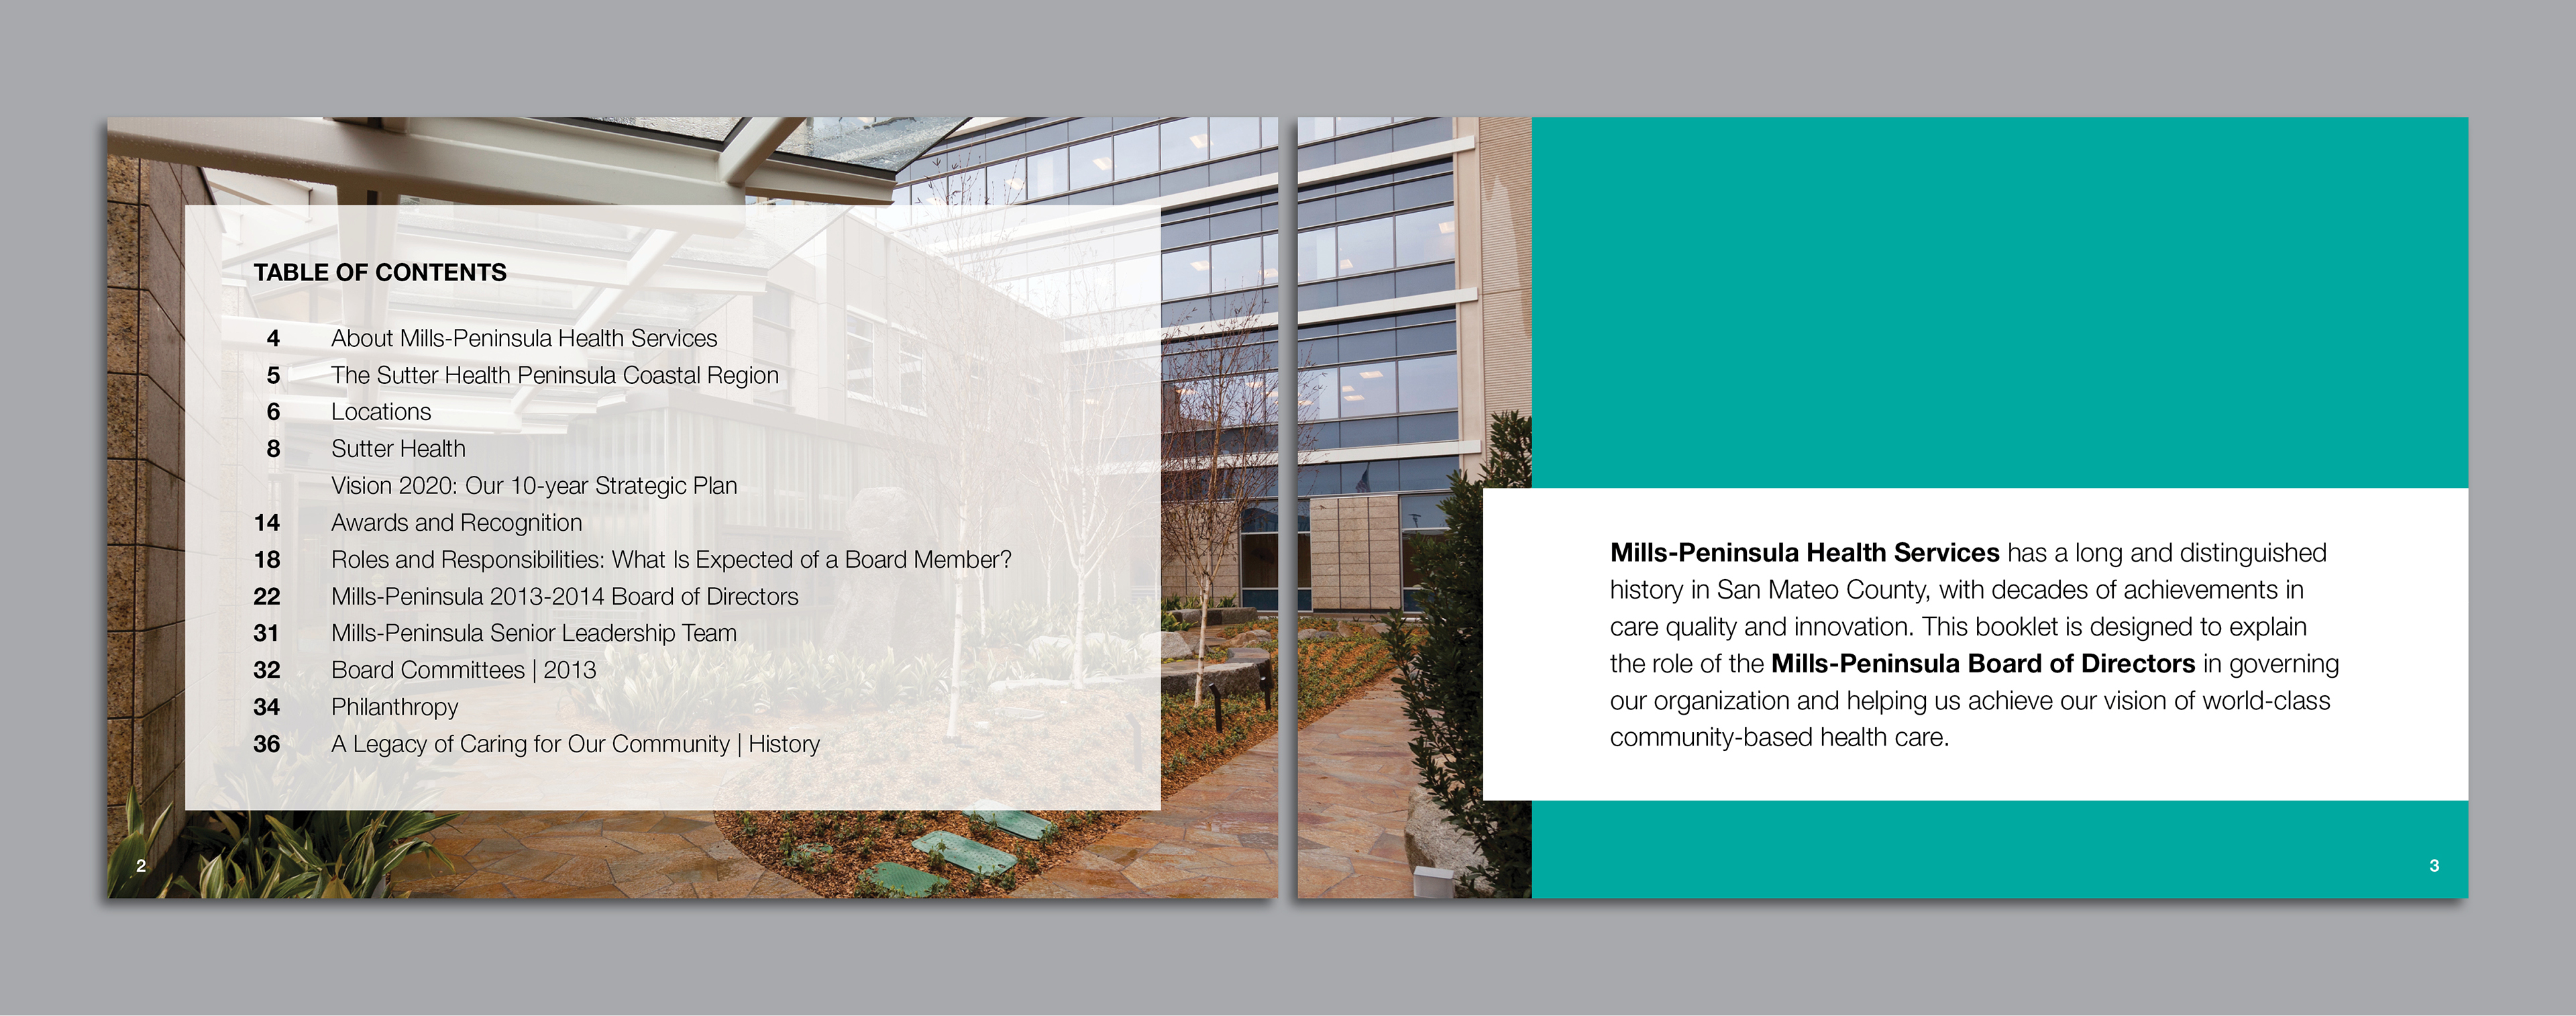 David Cruz | Graphic Designer | Tonalli Design - MPHS Board of